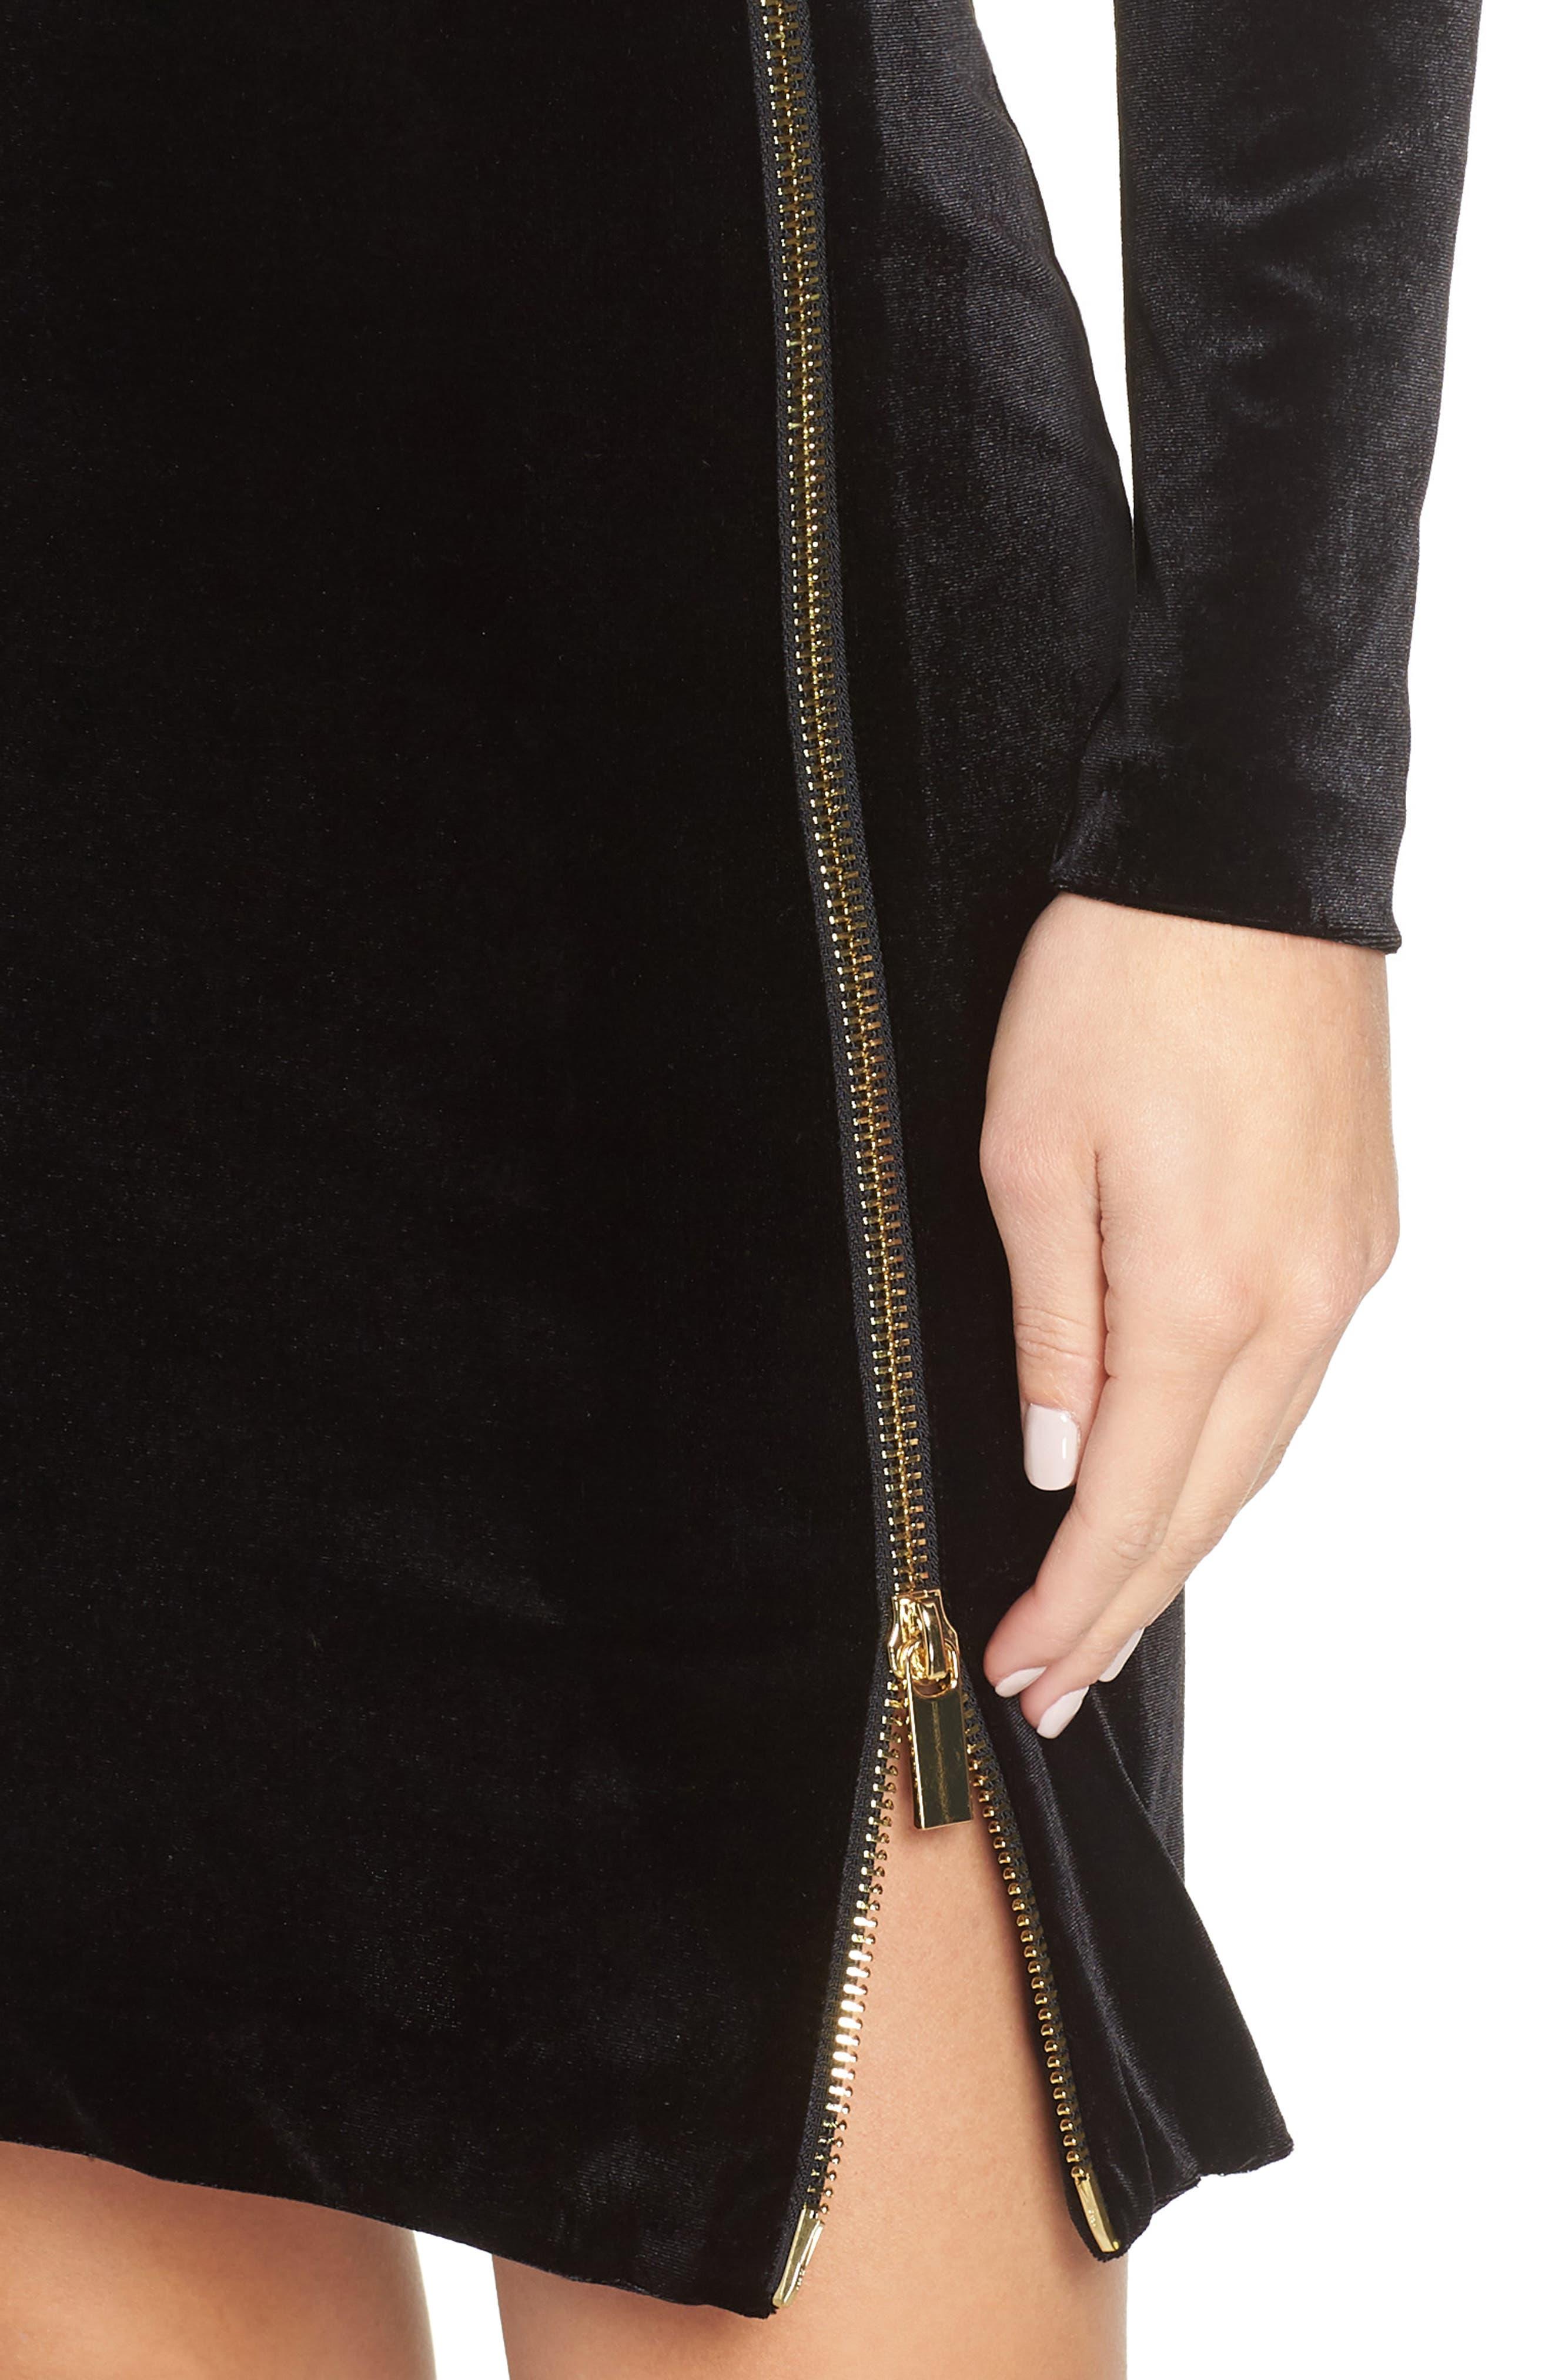 Zella Aurore Velvet Jersey Sheath Dress,                             Alternate thumbnail 4, color,                             BLACK GOLD